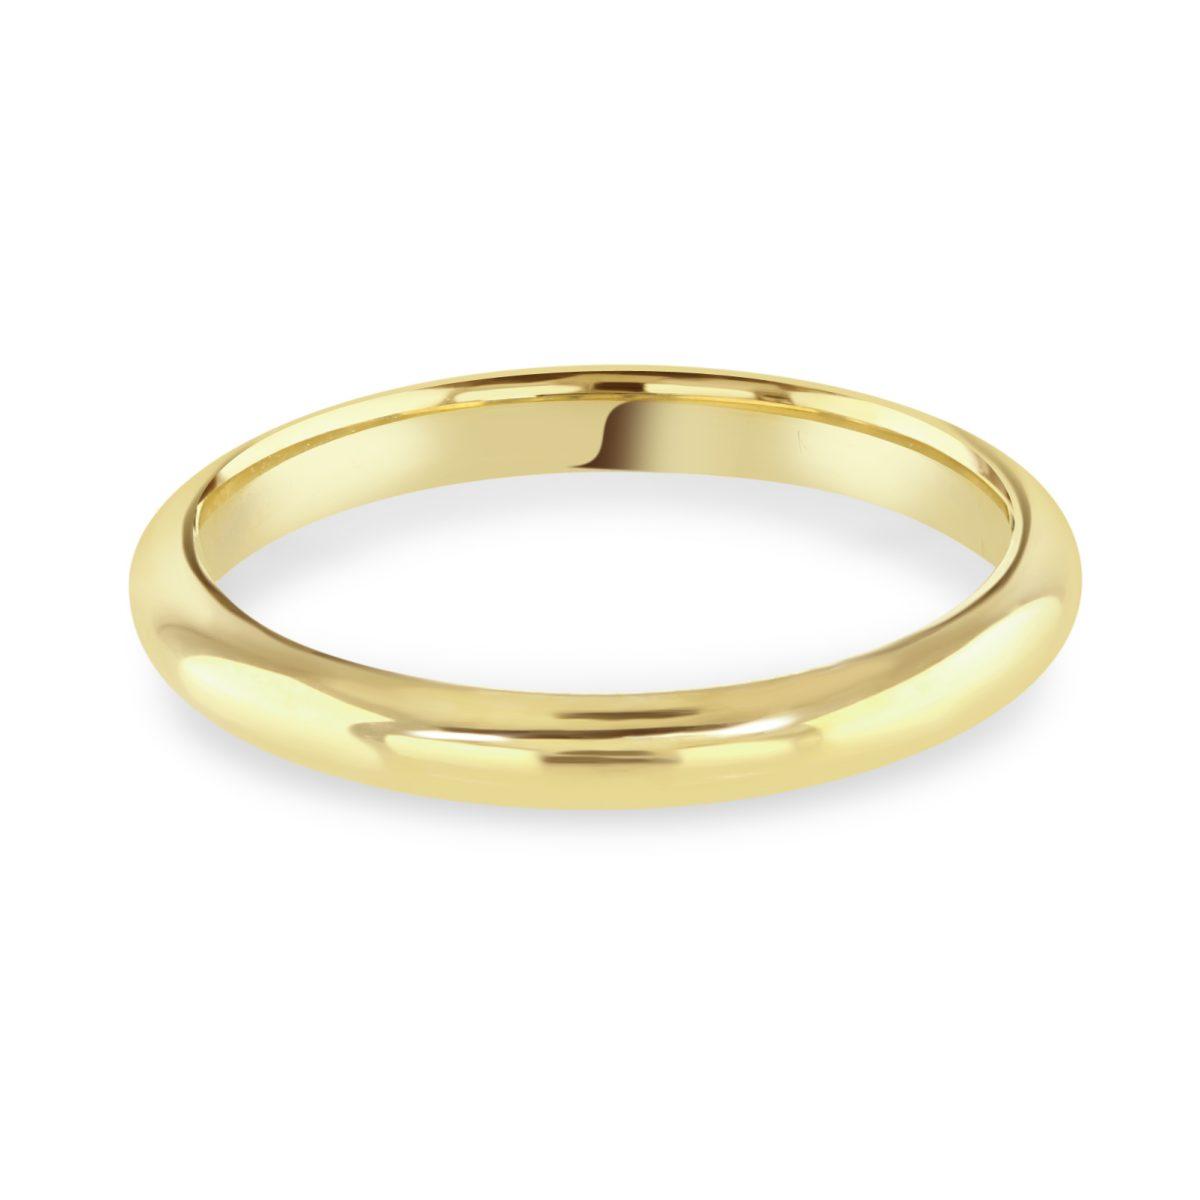 wedding-bands/23-02-024.jpg;;wedding-bands/23-02-024 - flip.jpg